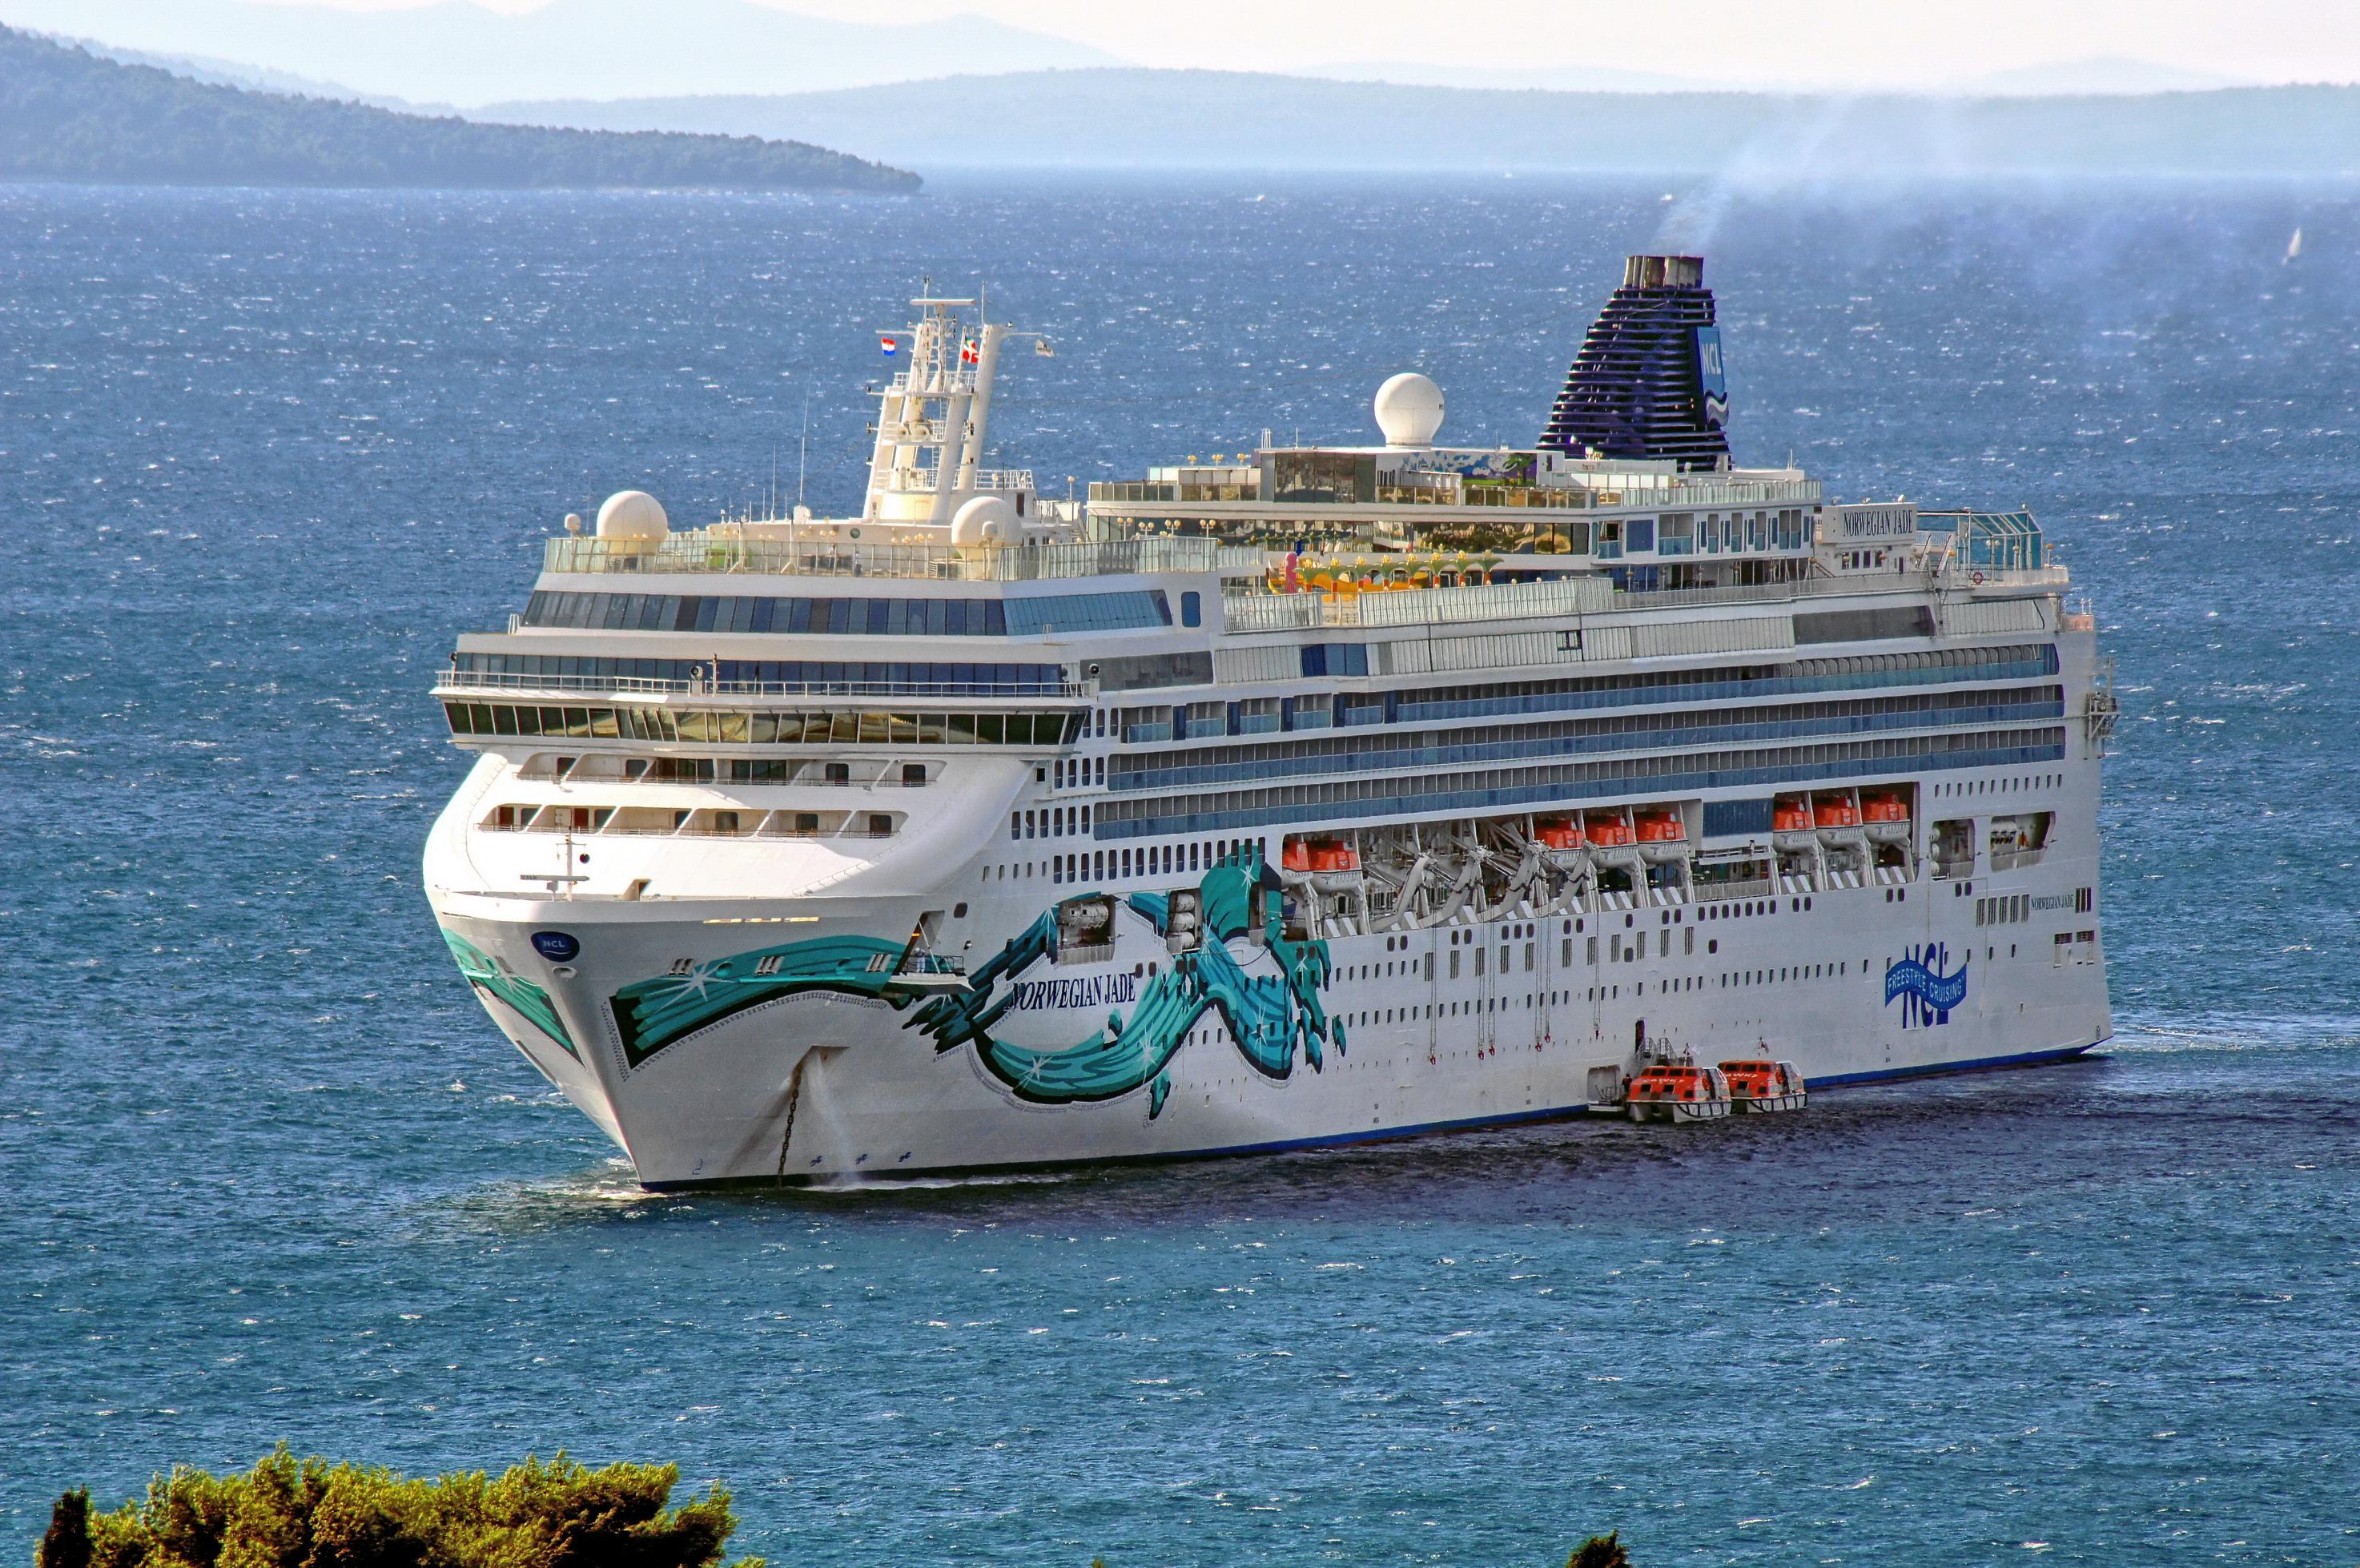 FileNorwegian Jade (ship 2006) IMO 9304057; In Split 2011-10-10; (1).jpg - Wikimedia Commons